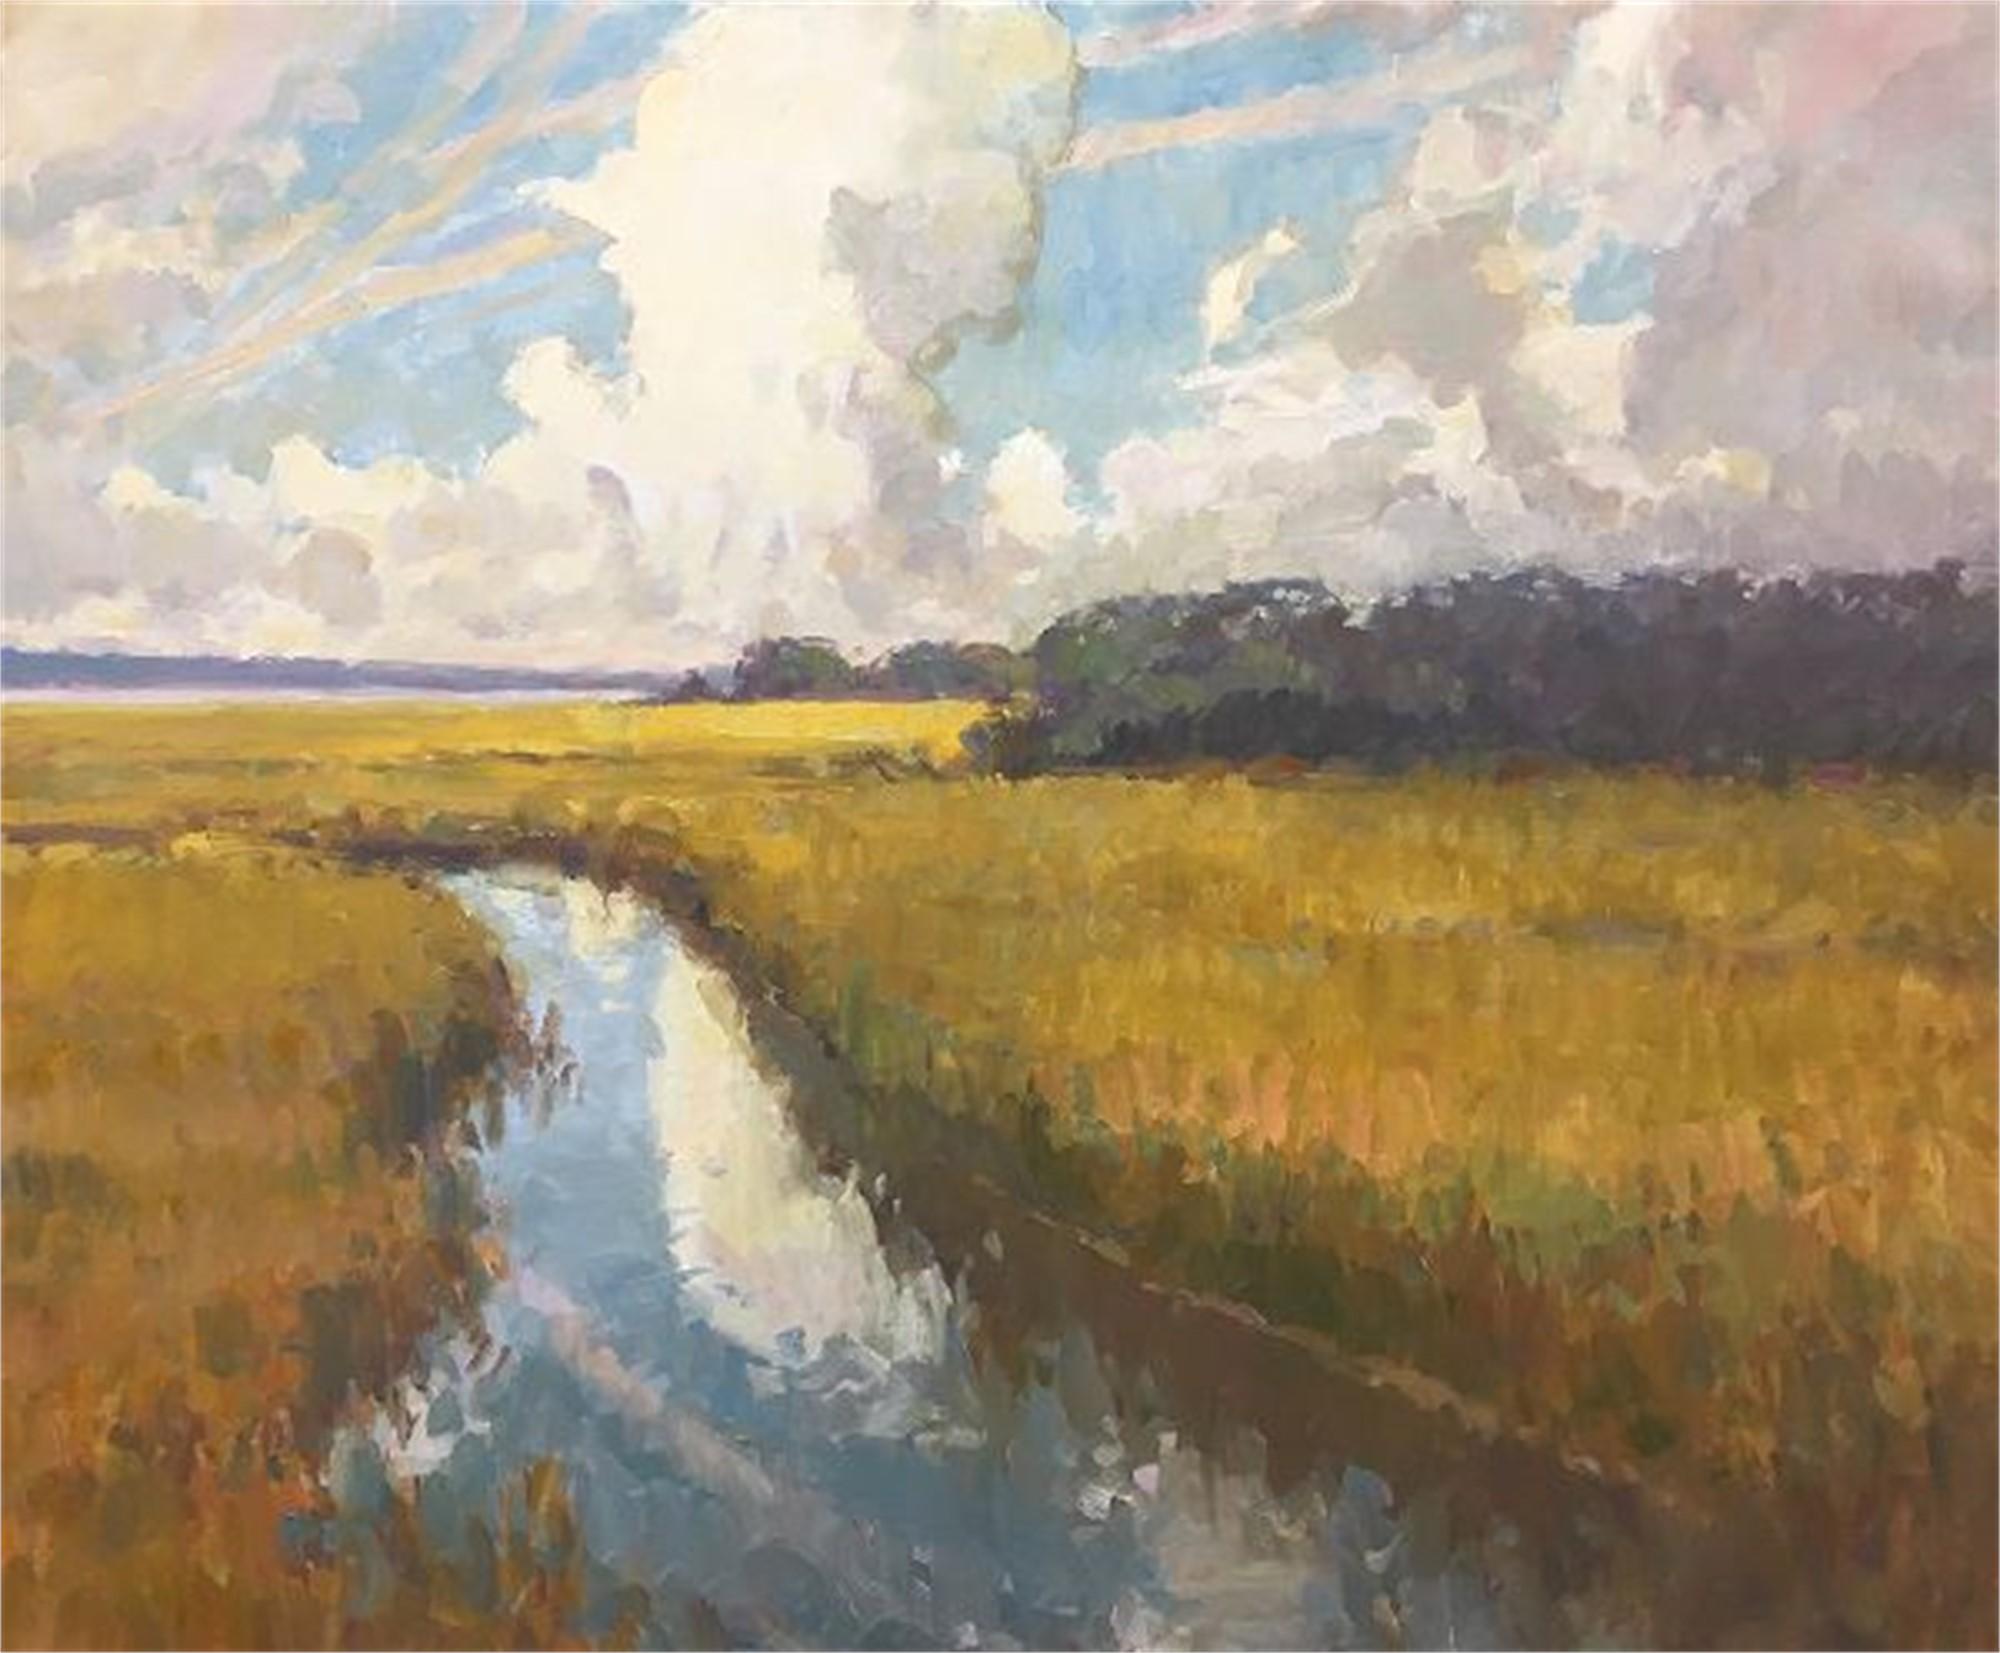 Marsh Drama (Shem Creek) by Richard Oversmith